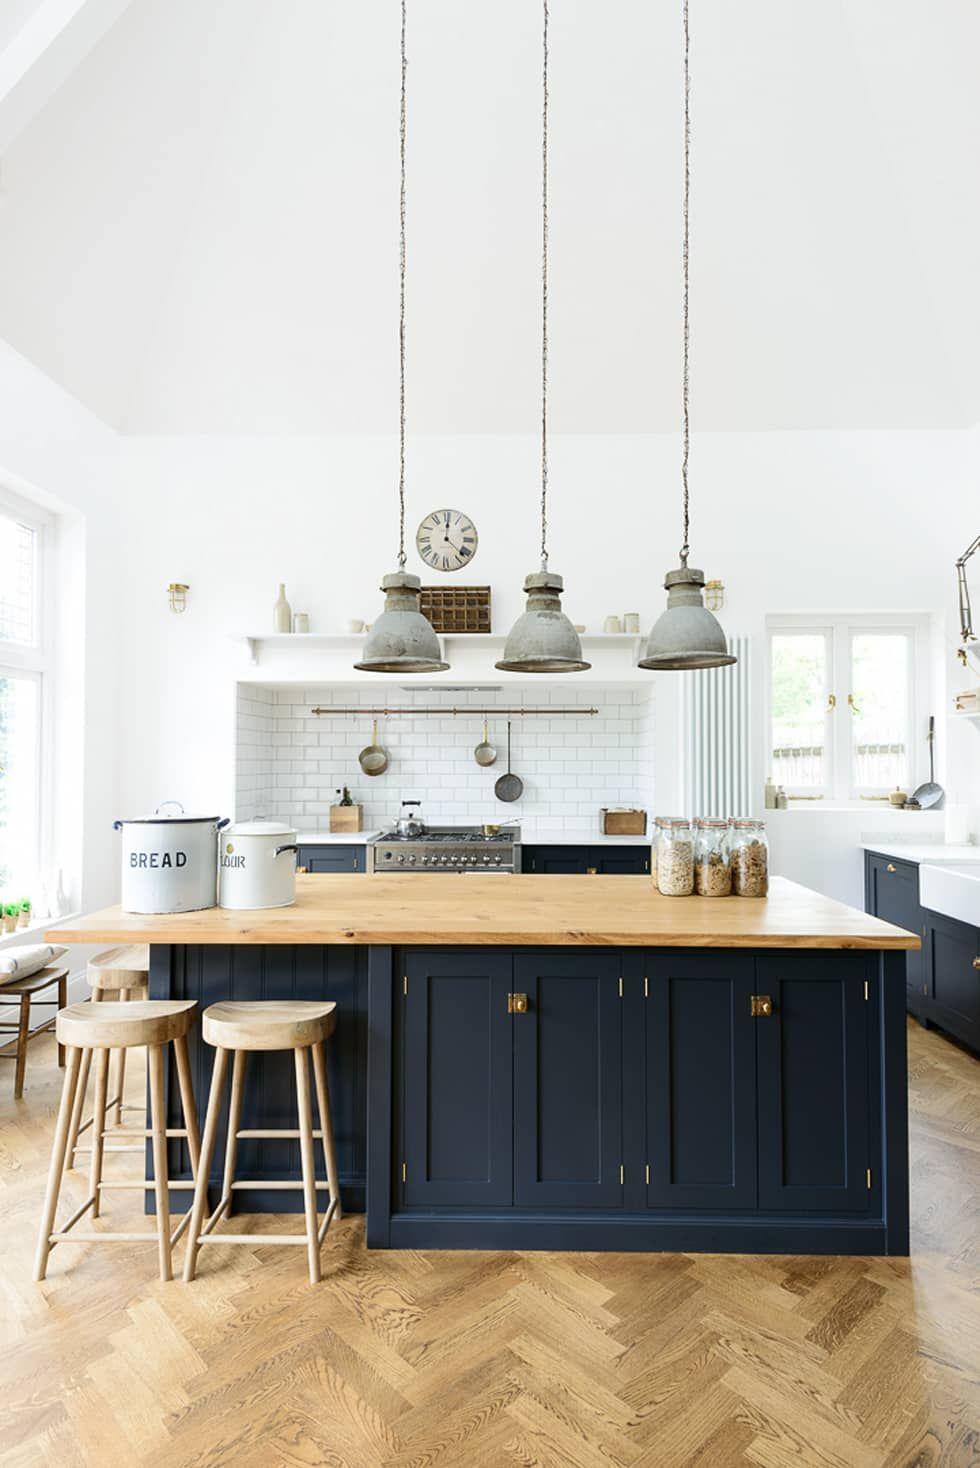 Interior Design Ideas, Redecorating & Remodeling Photos | Industrial ...